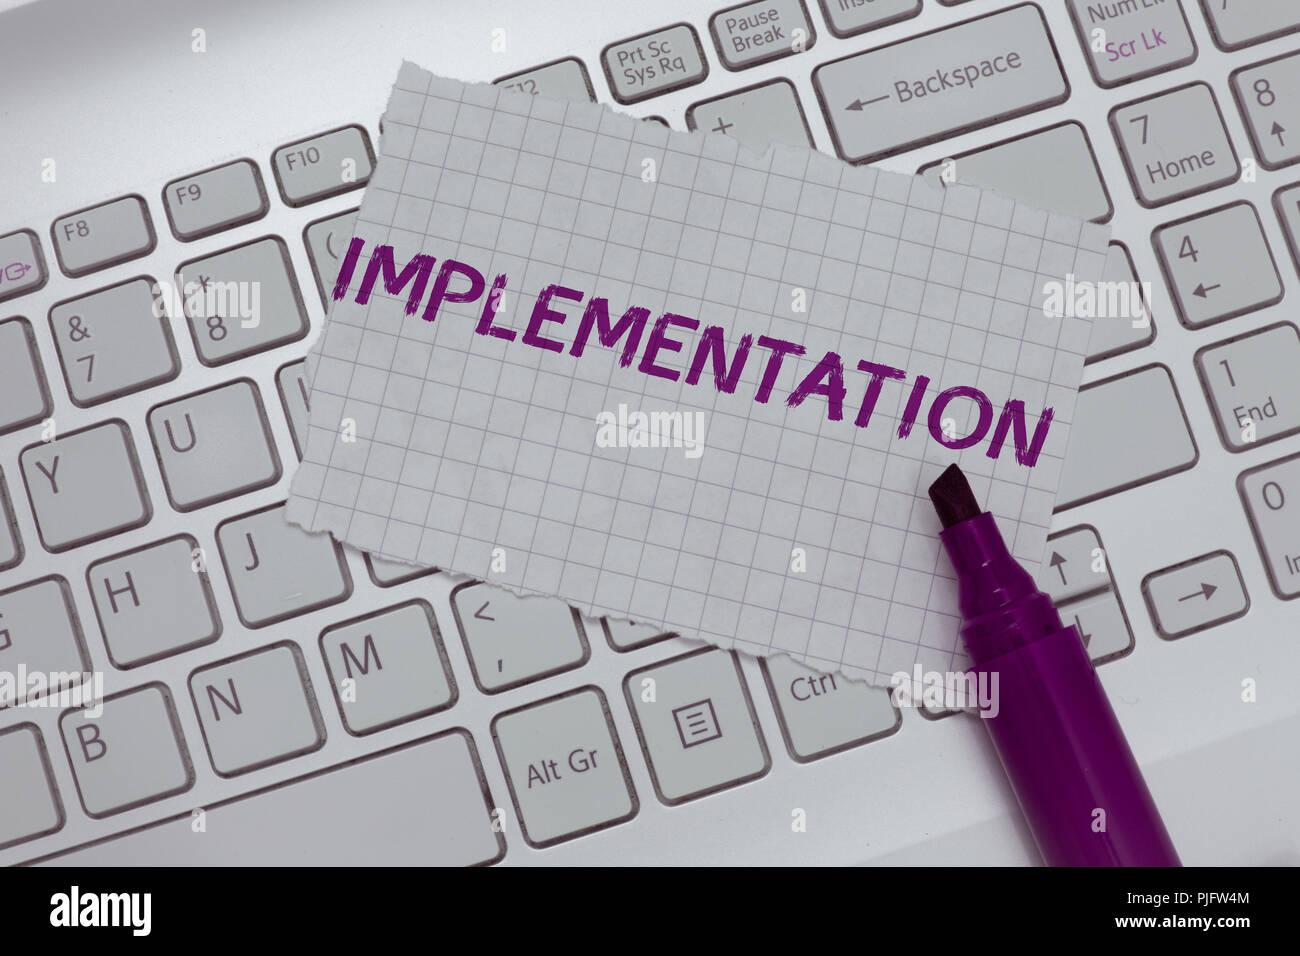 Force Application Imágenes De Stock & Force Application Fotos De ...